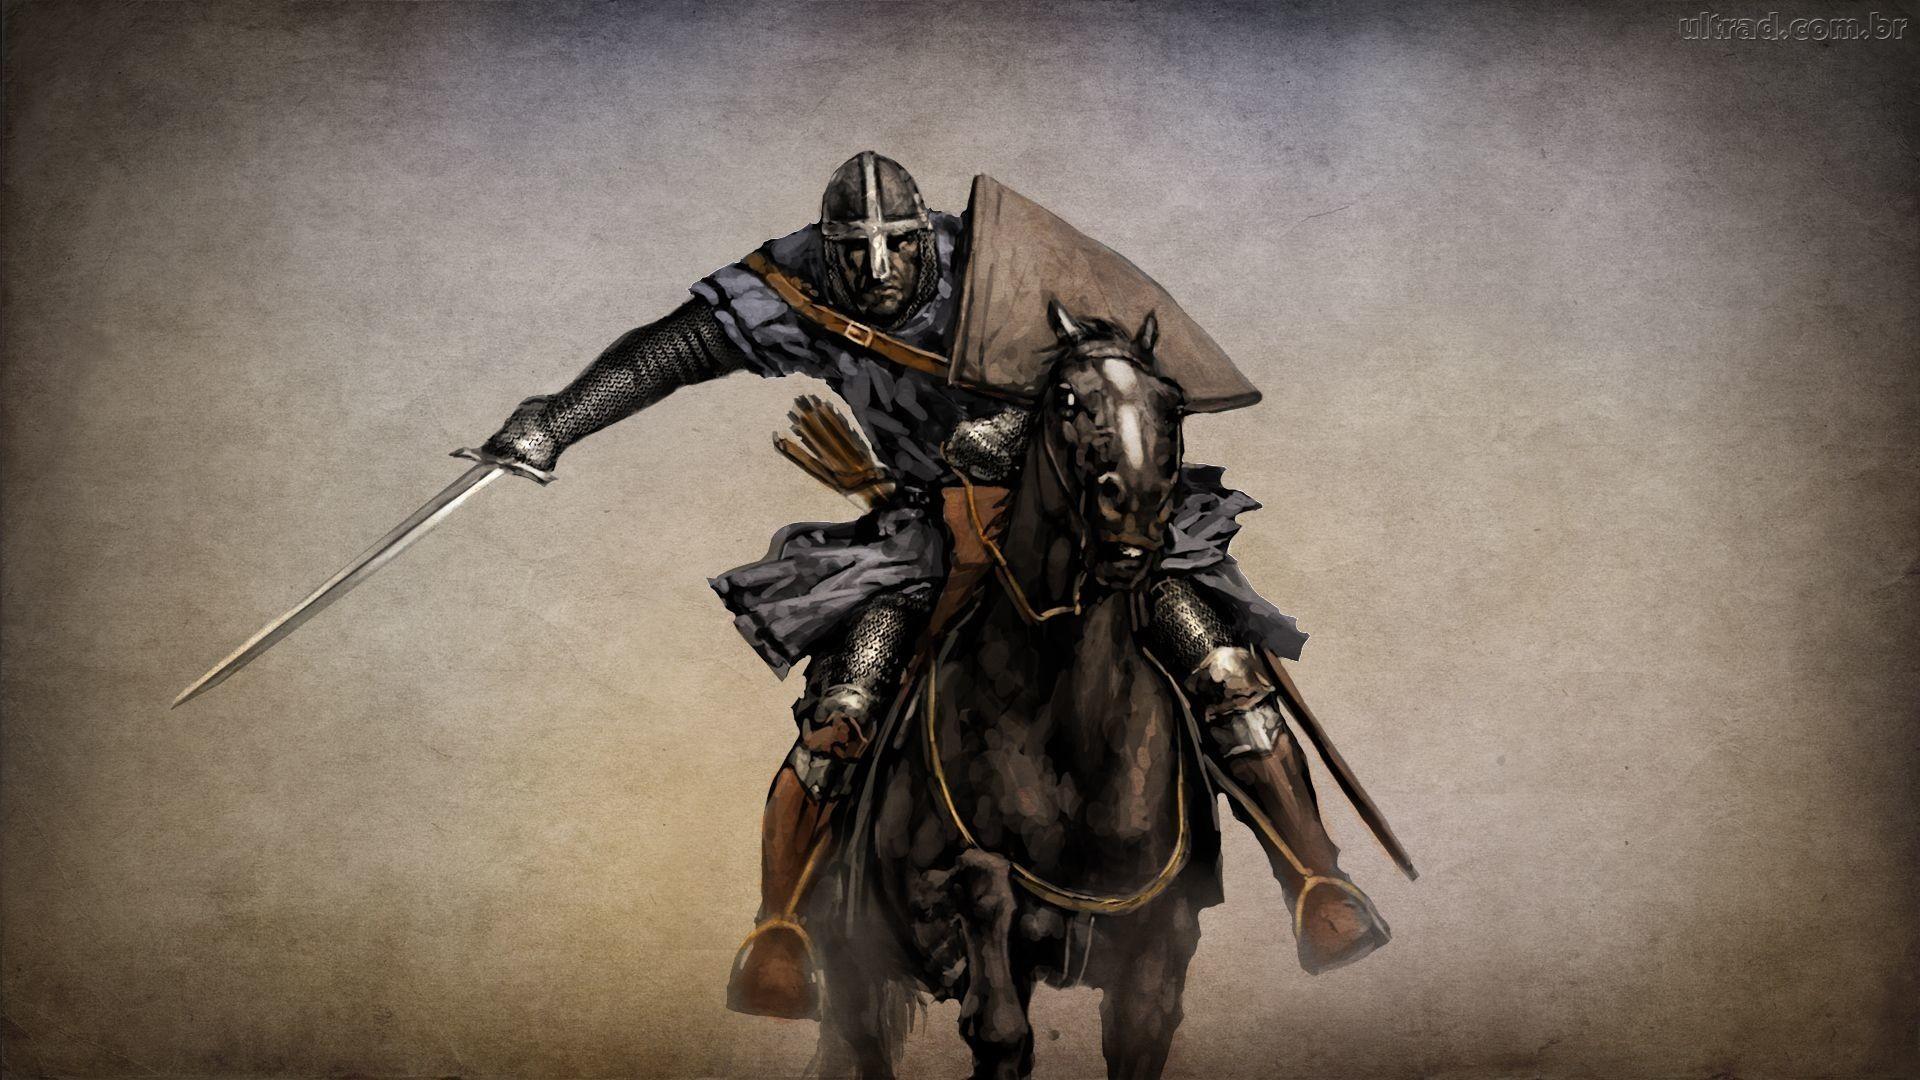 1920x1080, Knight Templar Skull Source - Mount And Blade Warband Artwork - HD Wallpaper